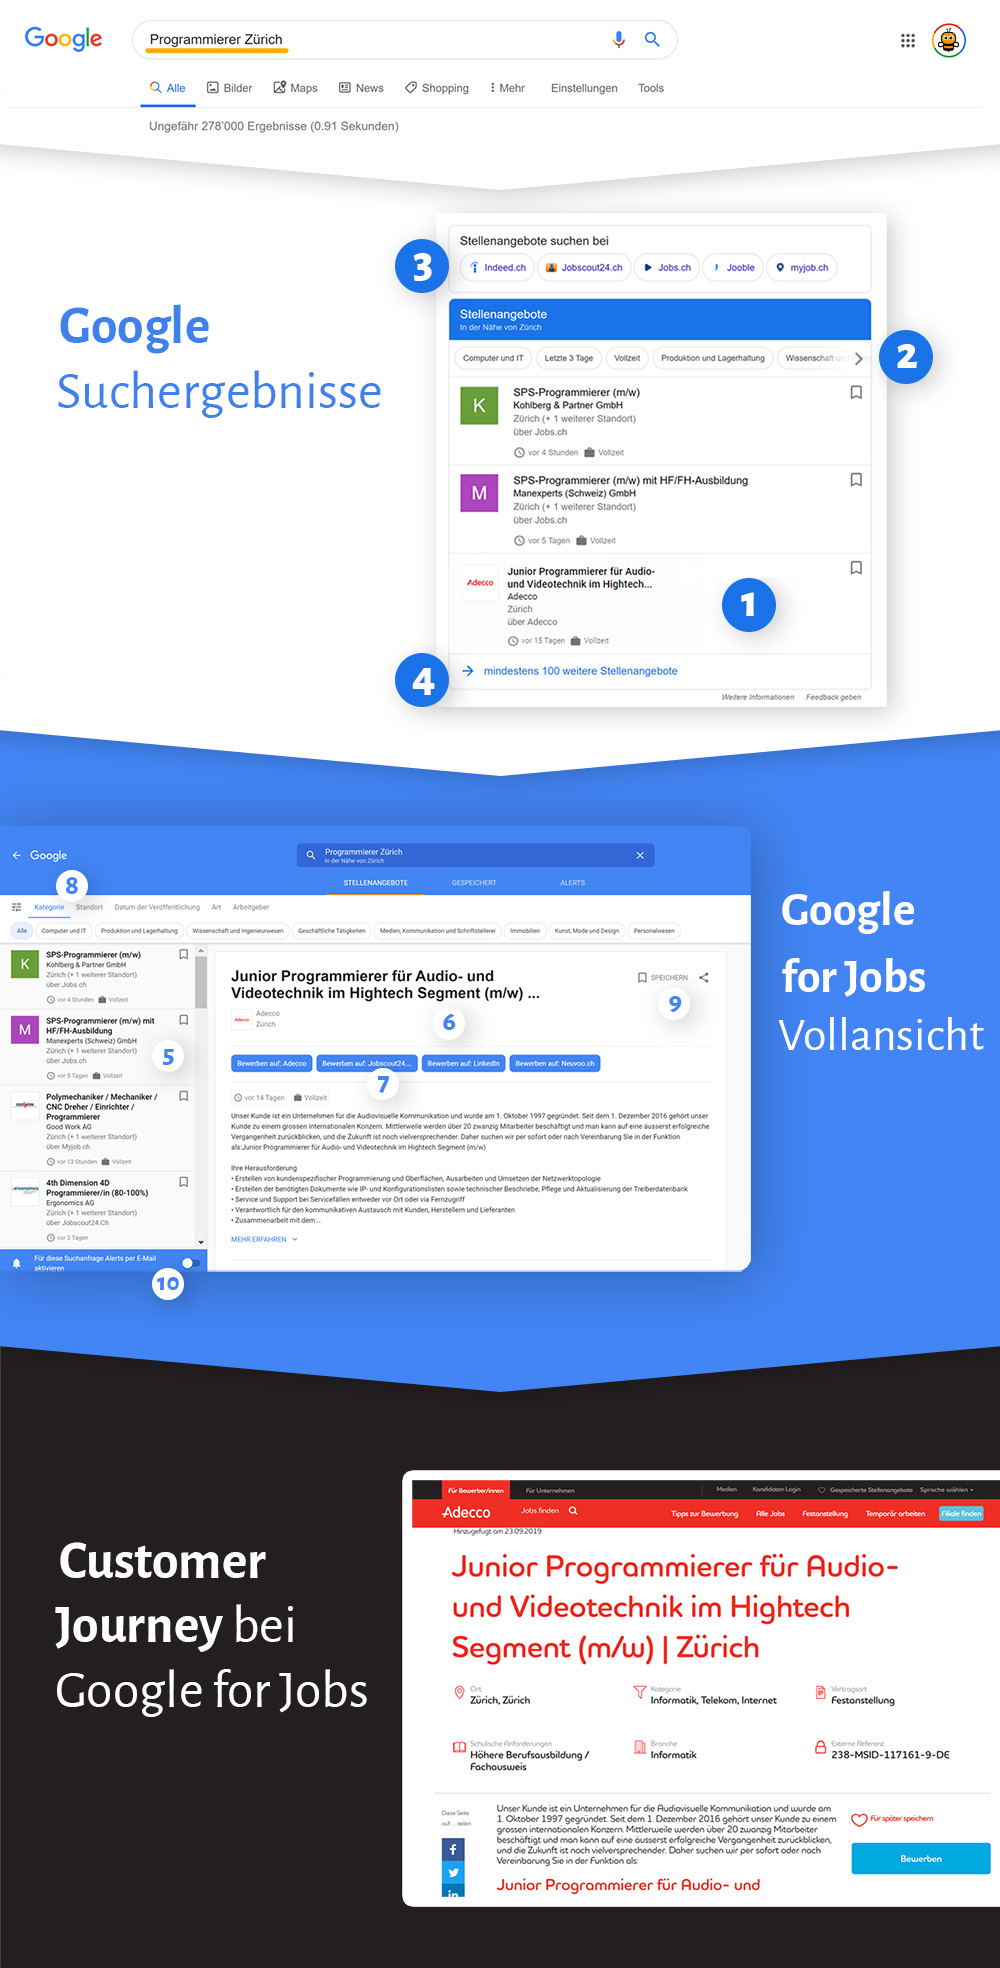 googleforjobs_infografik